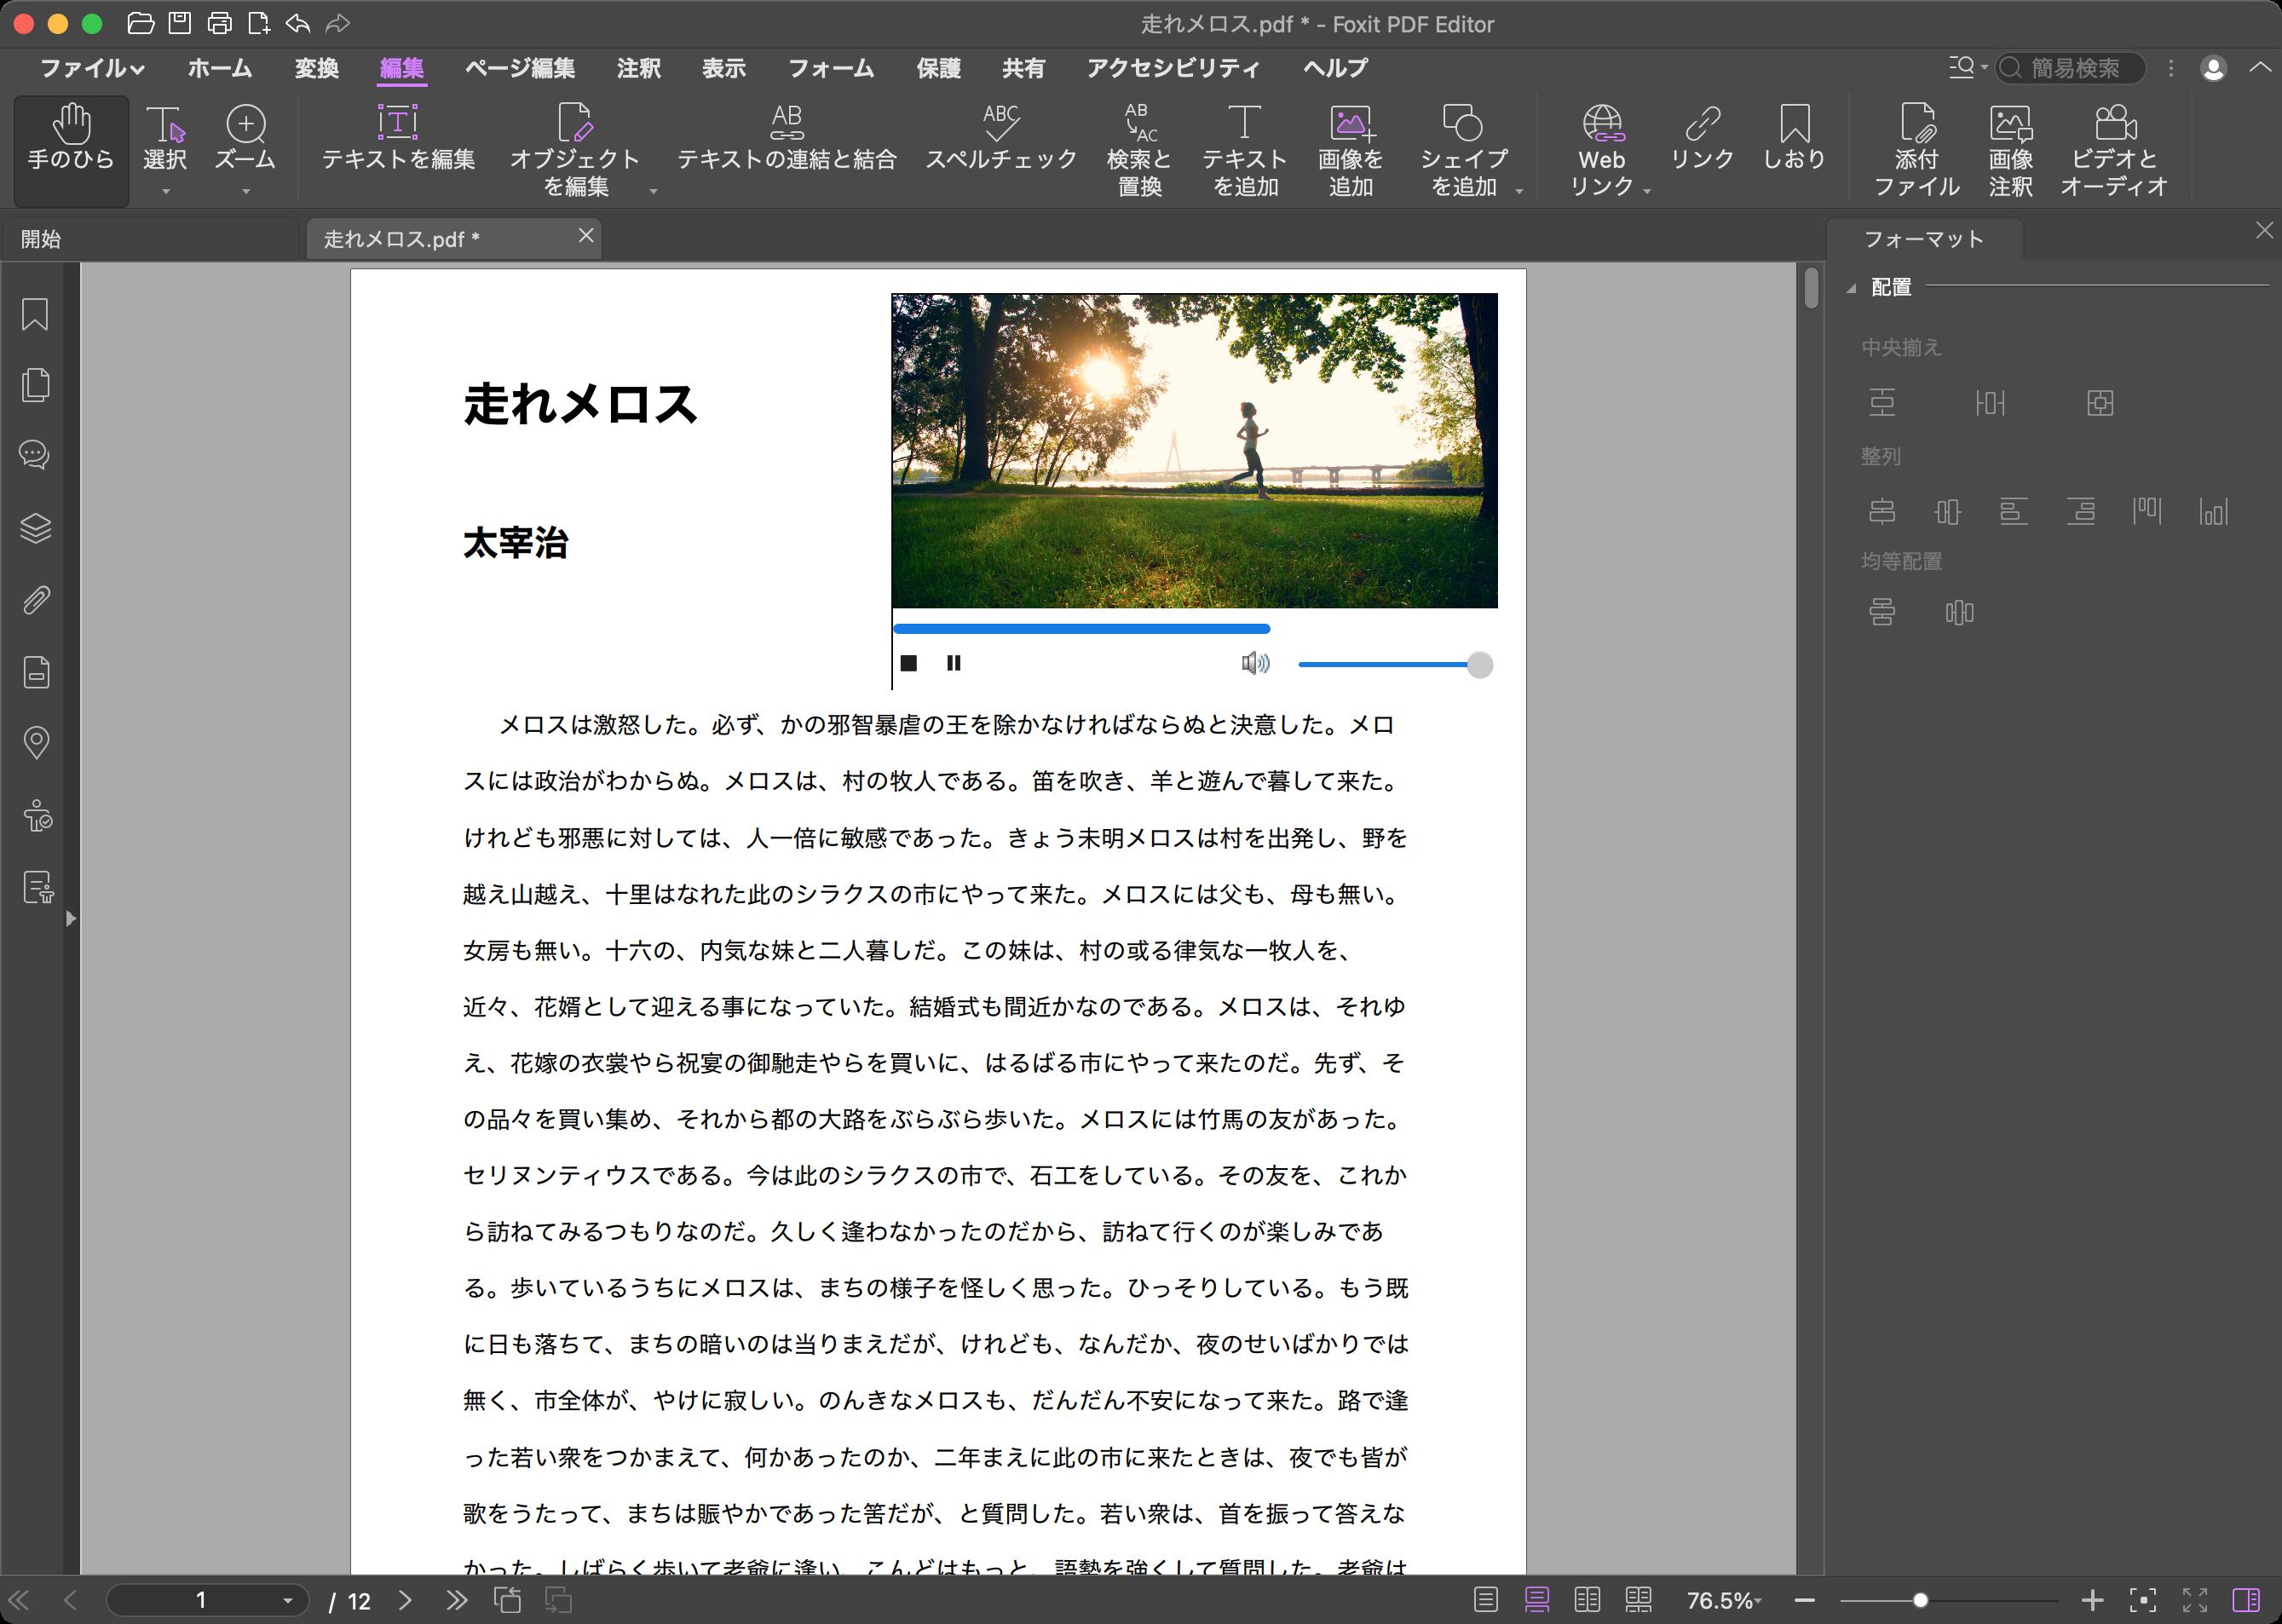 Foxit PDF Editor 動画再生